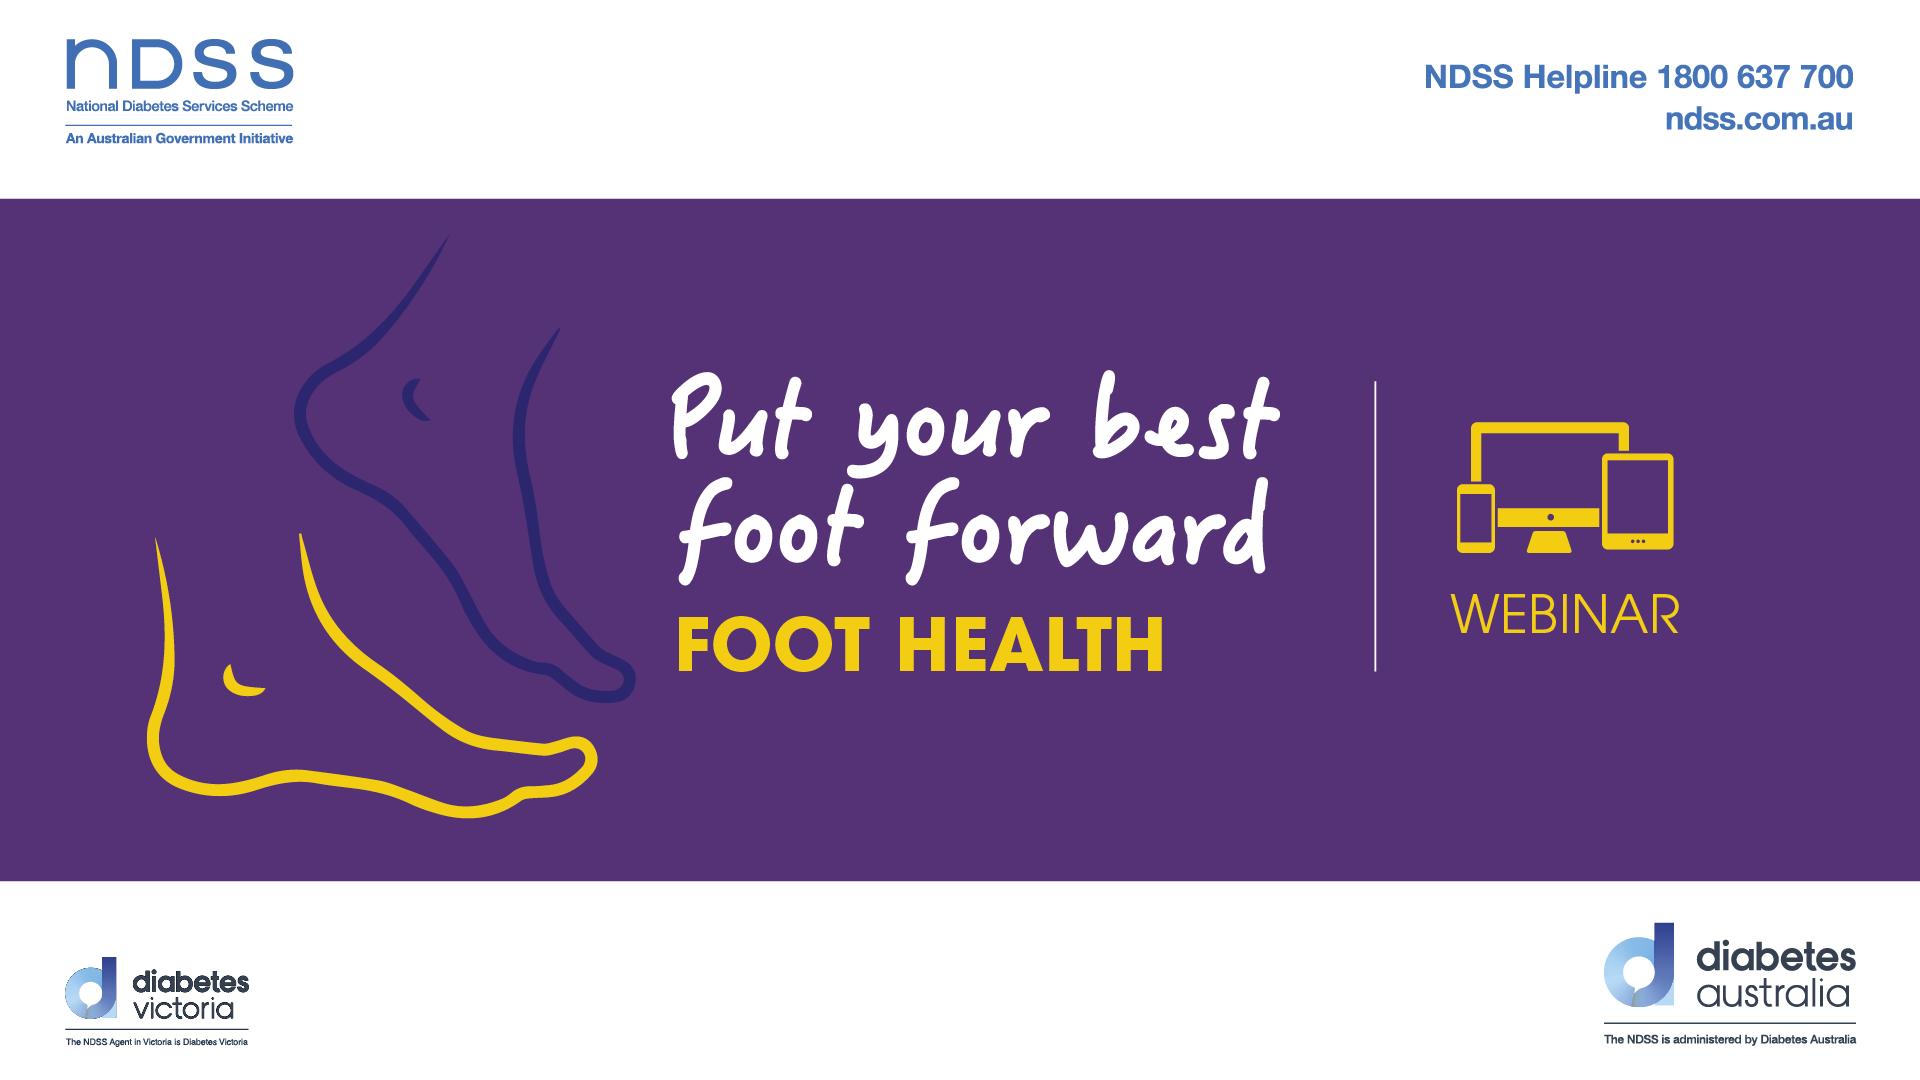 Put your best foot forward webinar